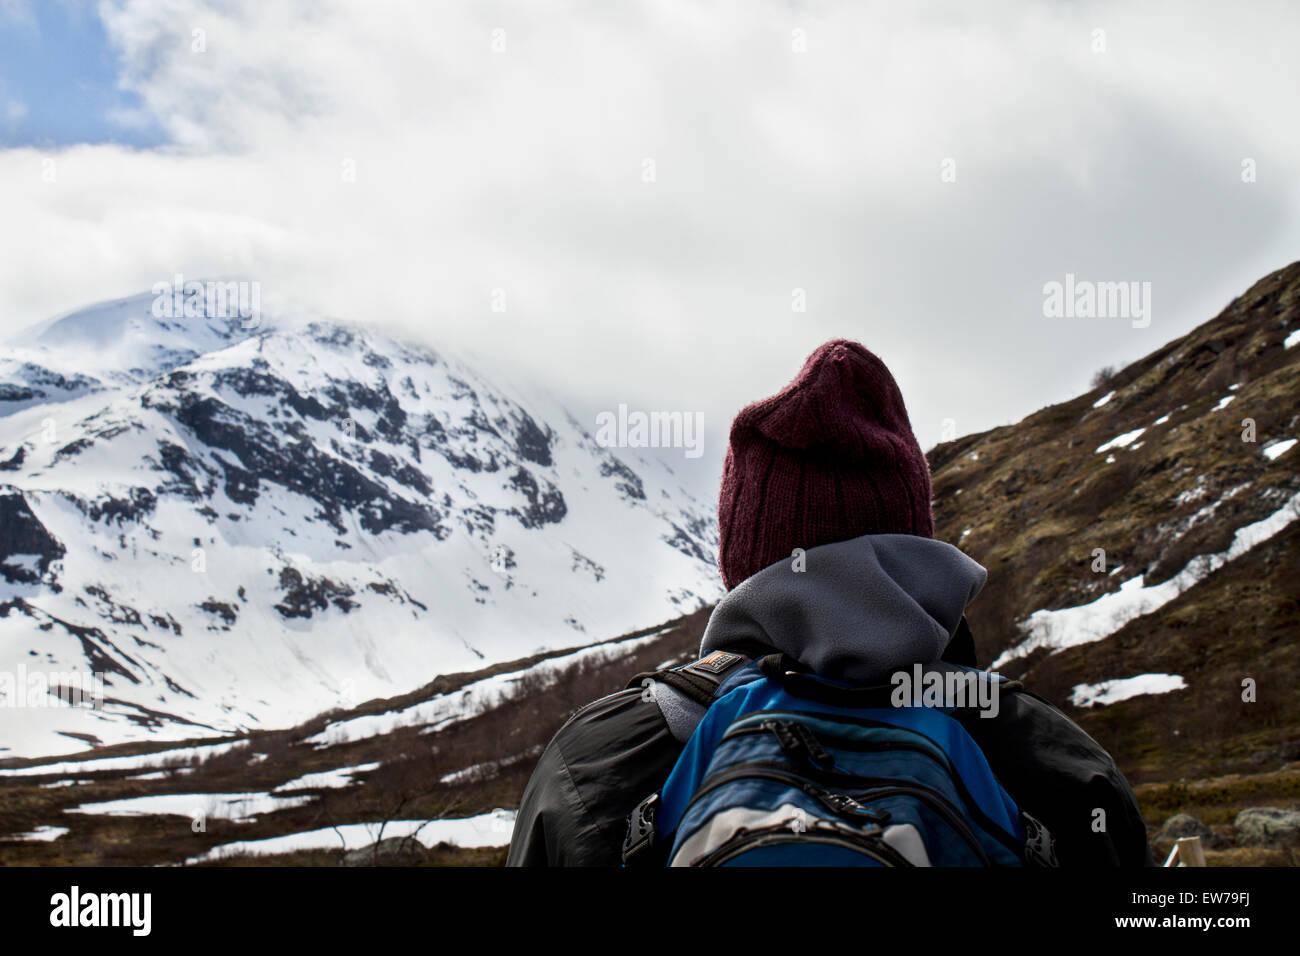 The mountains of Jotunheimen. A hiker is looking towards Galdhøpiggen - the highest peak in Norway. - Stock Image